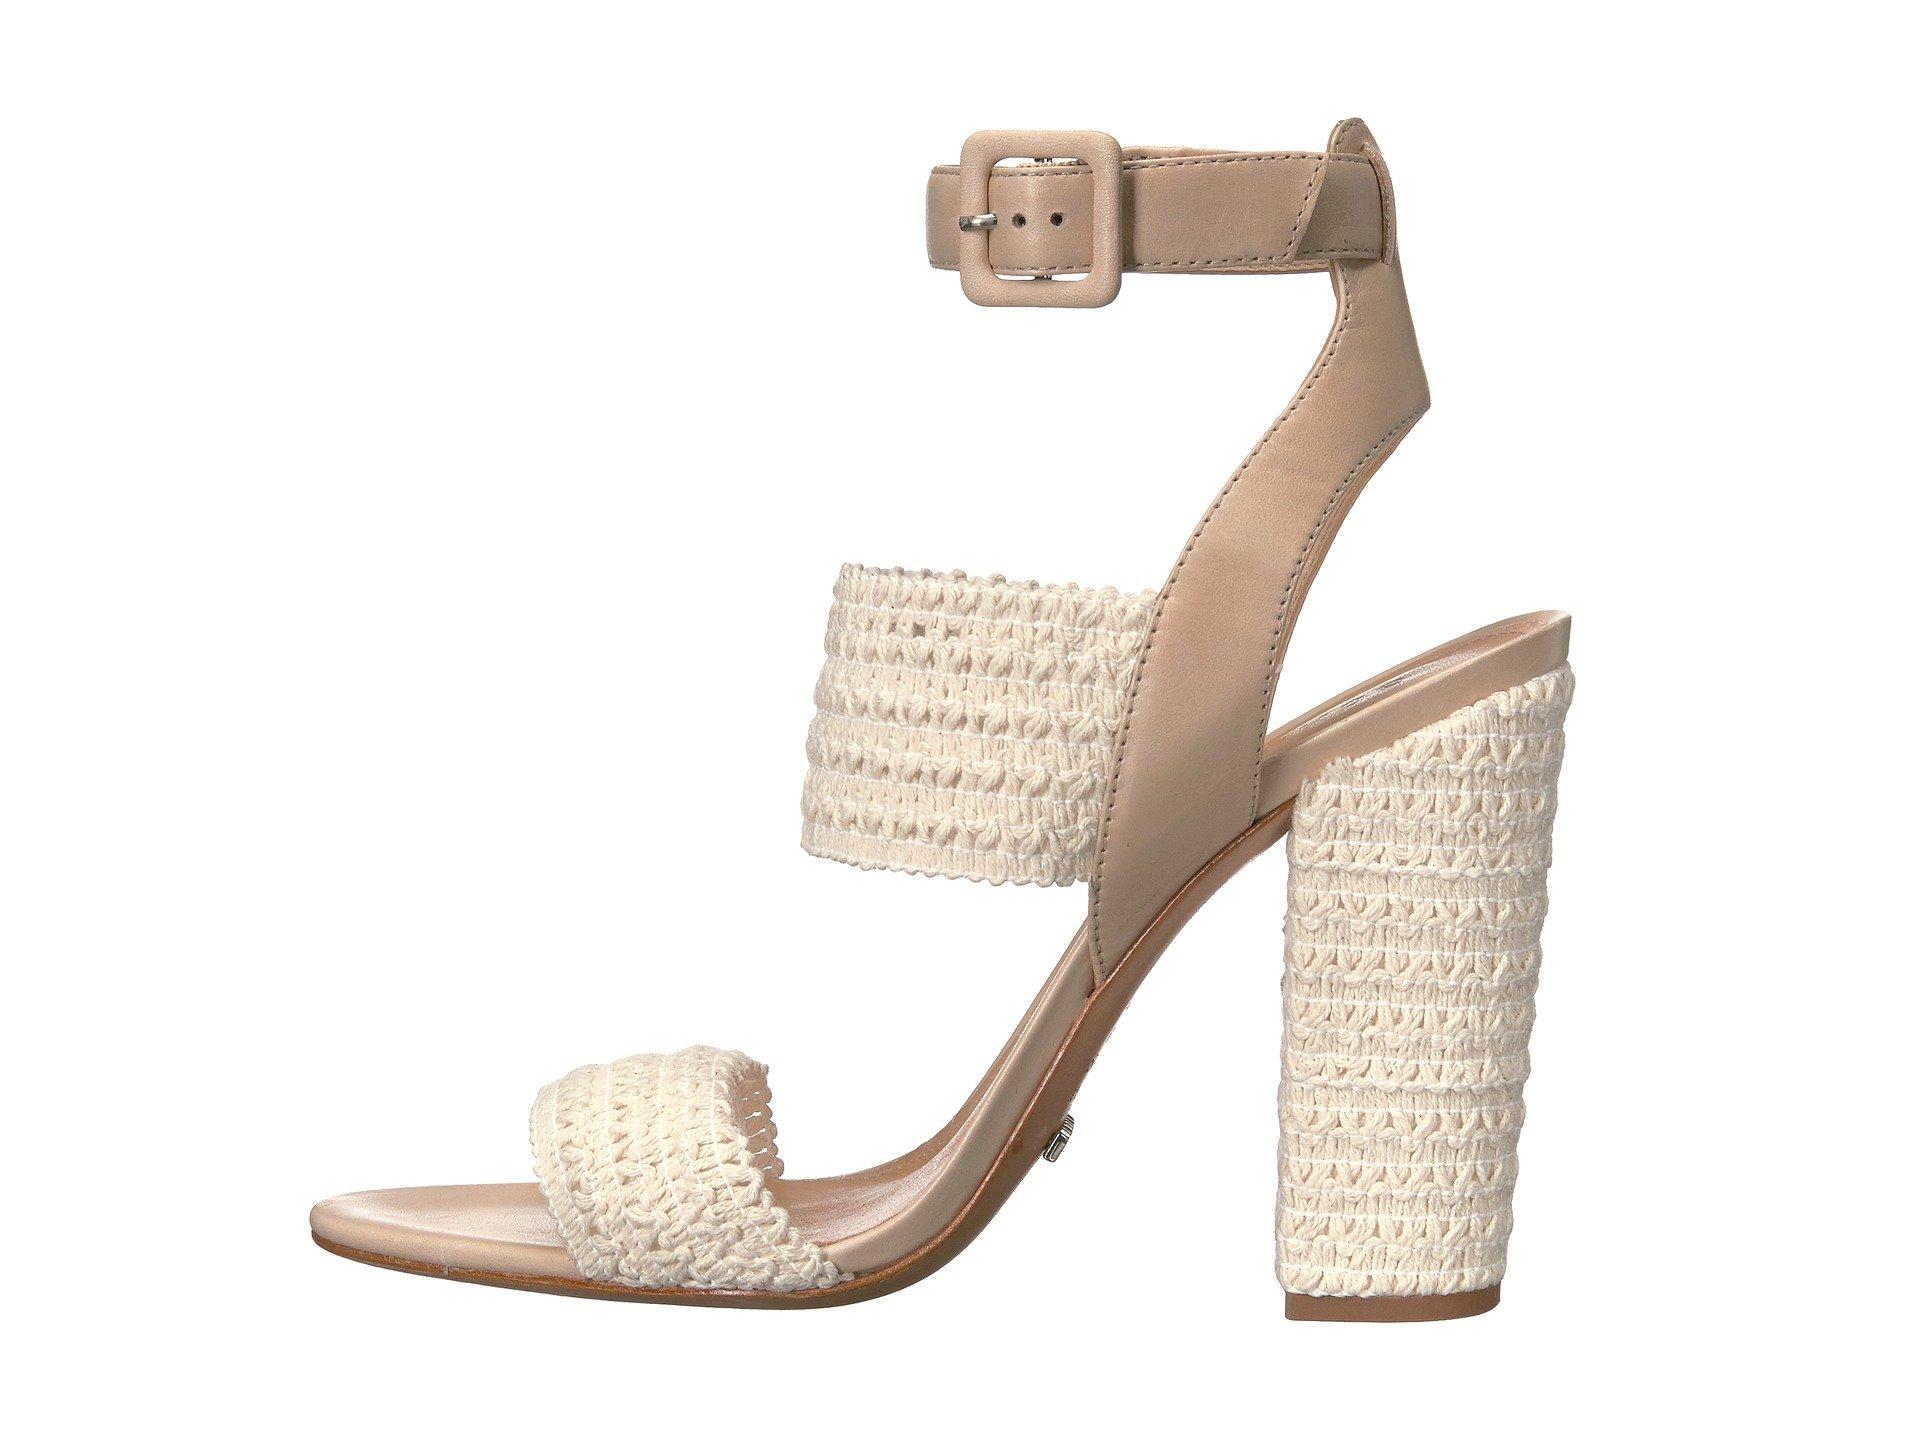 Schutz Woven Ankle Strap Sandals outlet cheap price cheap sale best sale nMwRvIt1Nm